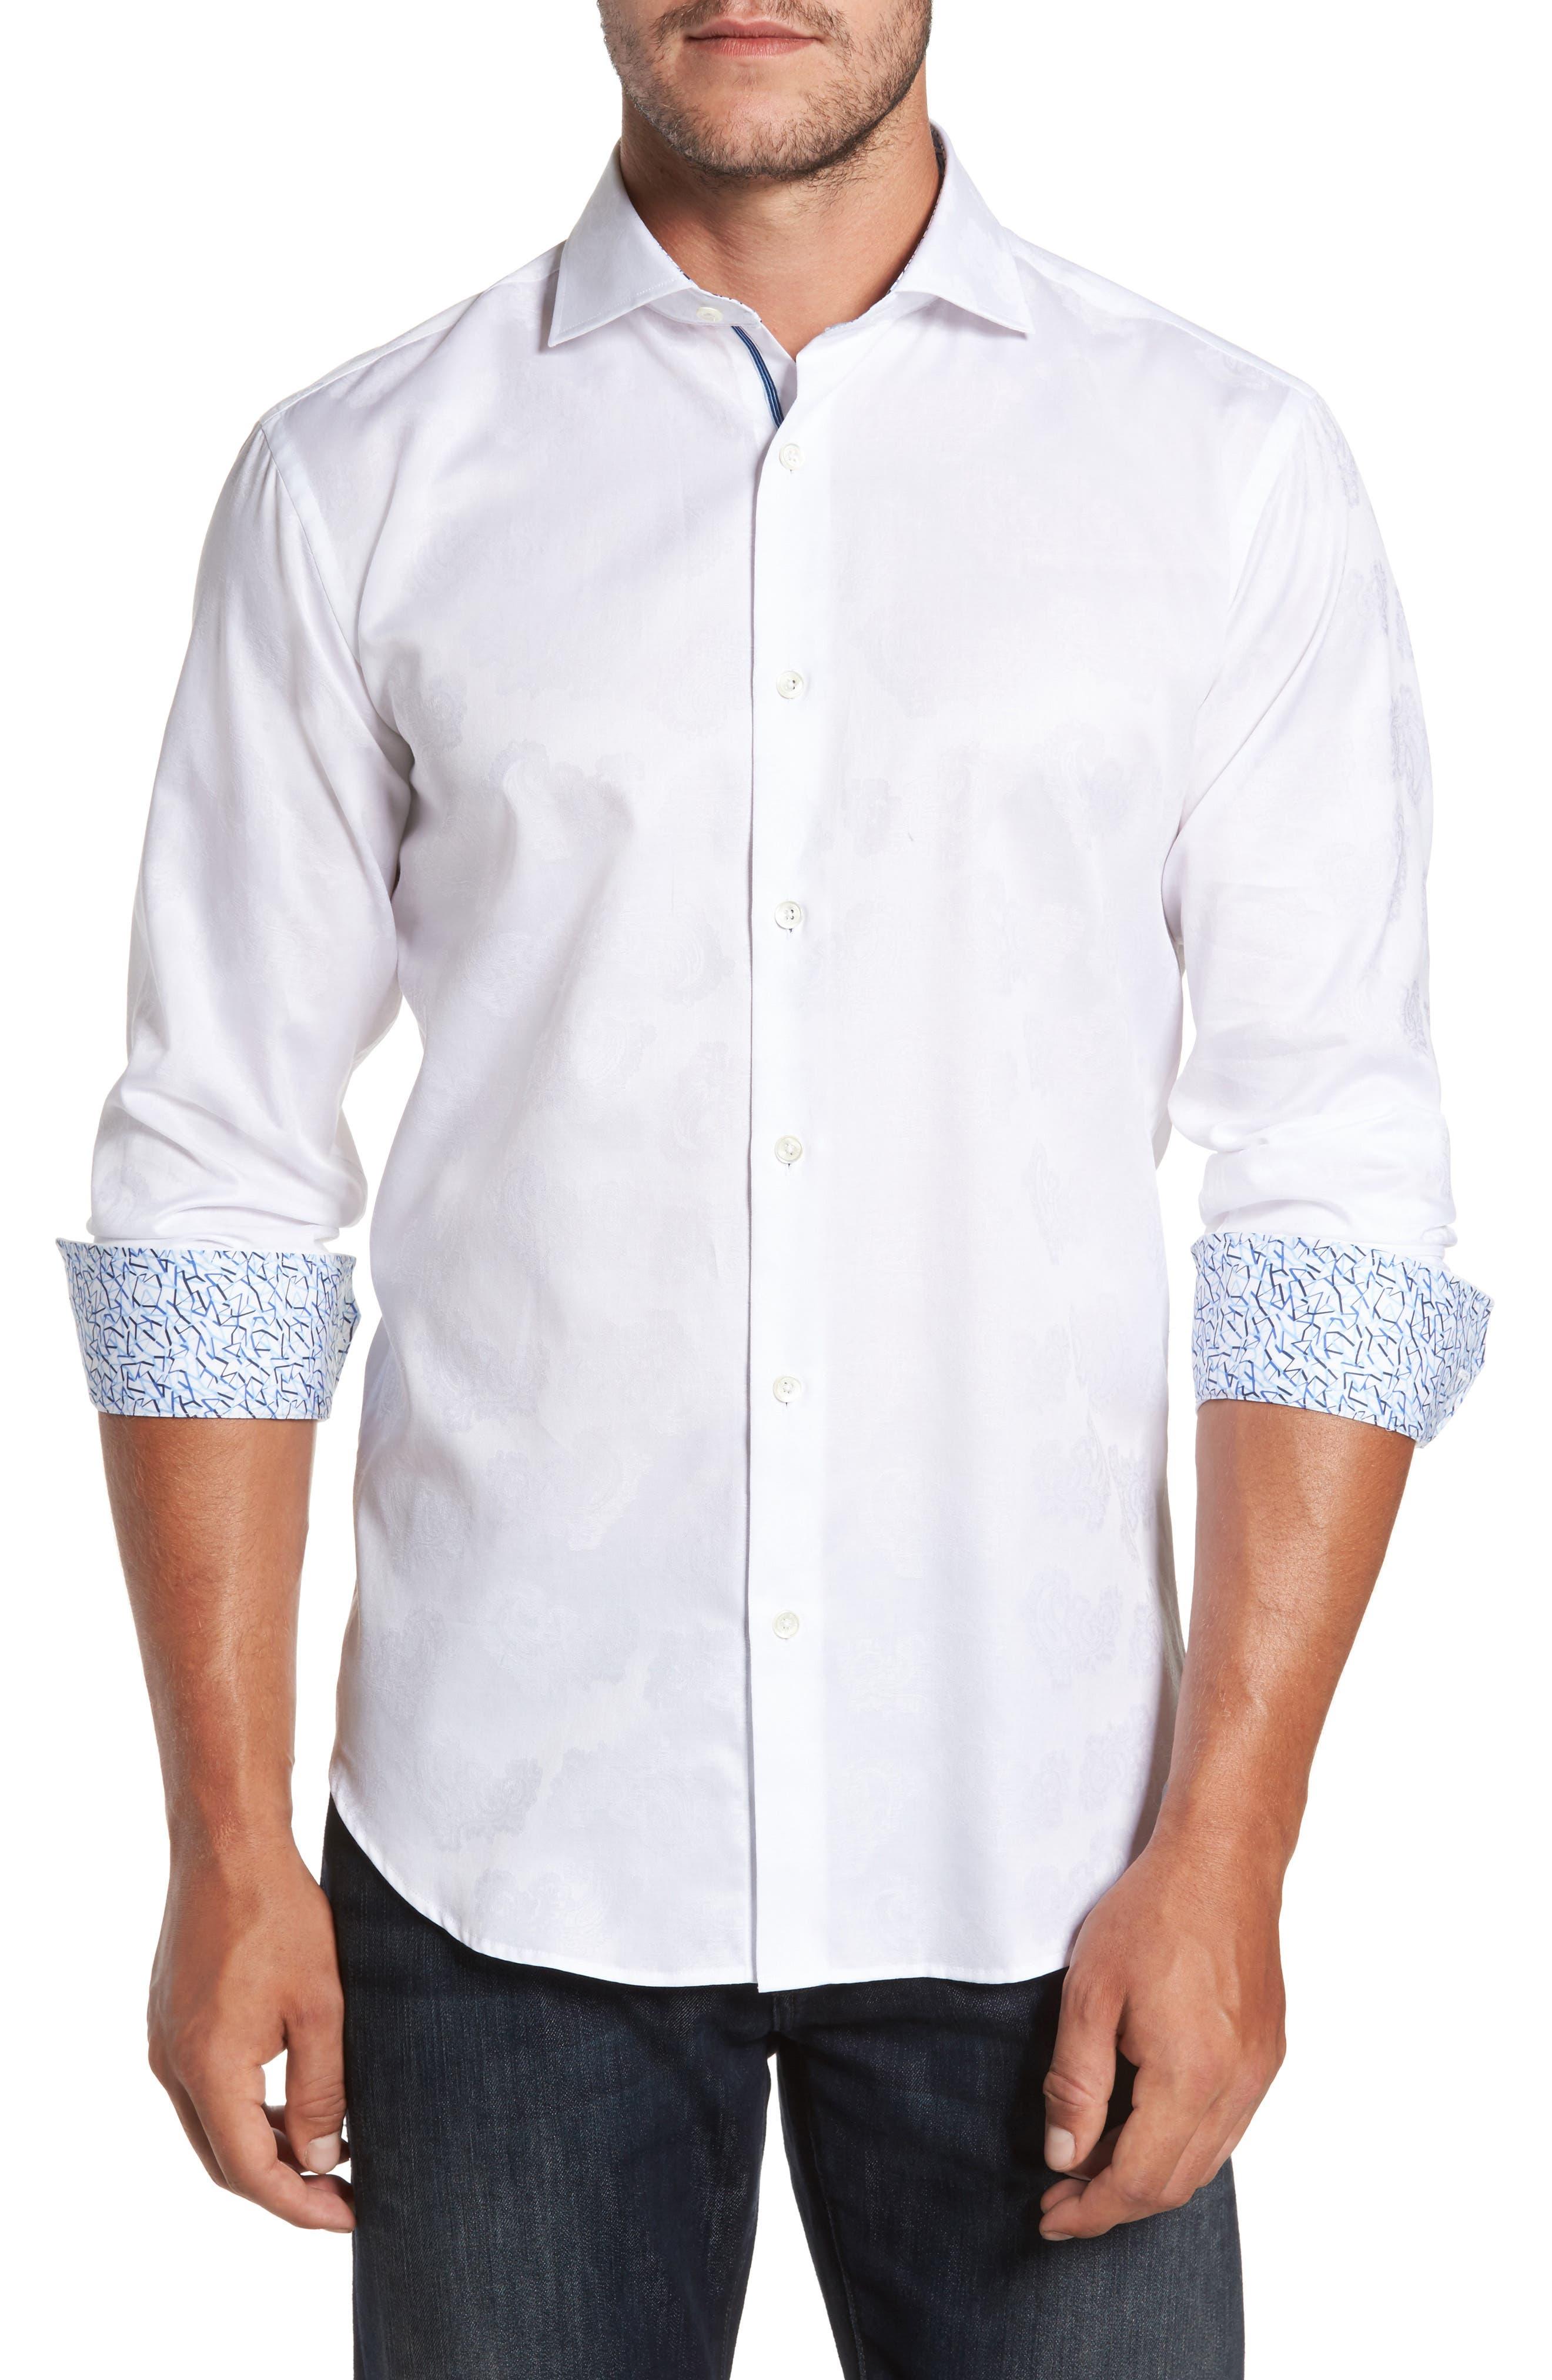 Main Image - Bugatchi Trim Fit Floral Jacquard Sport Shirt